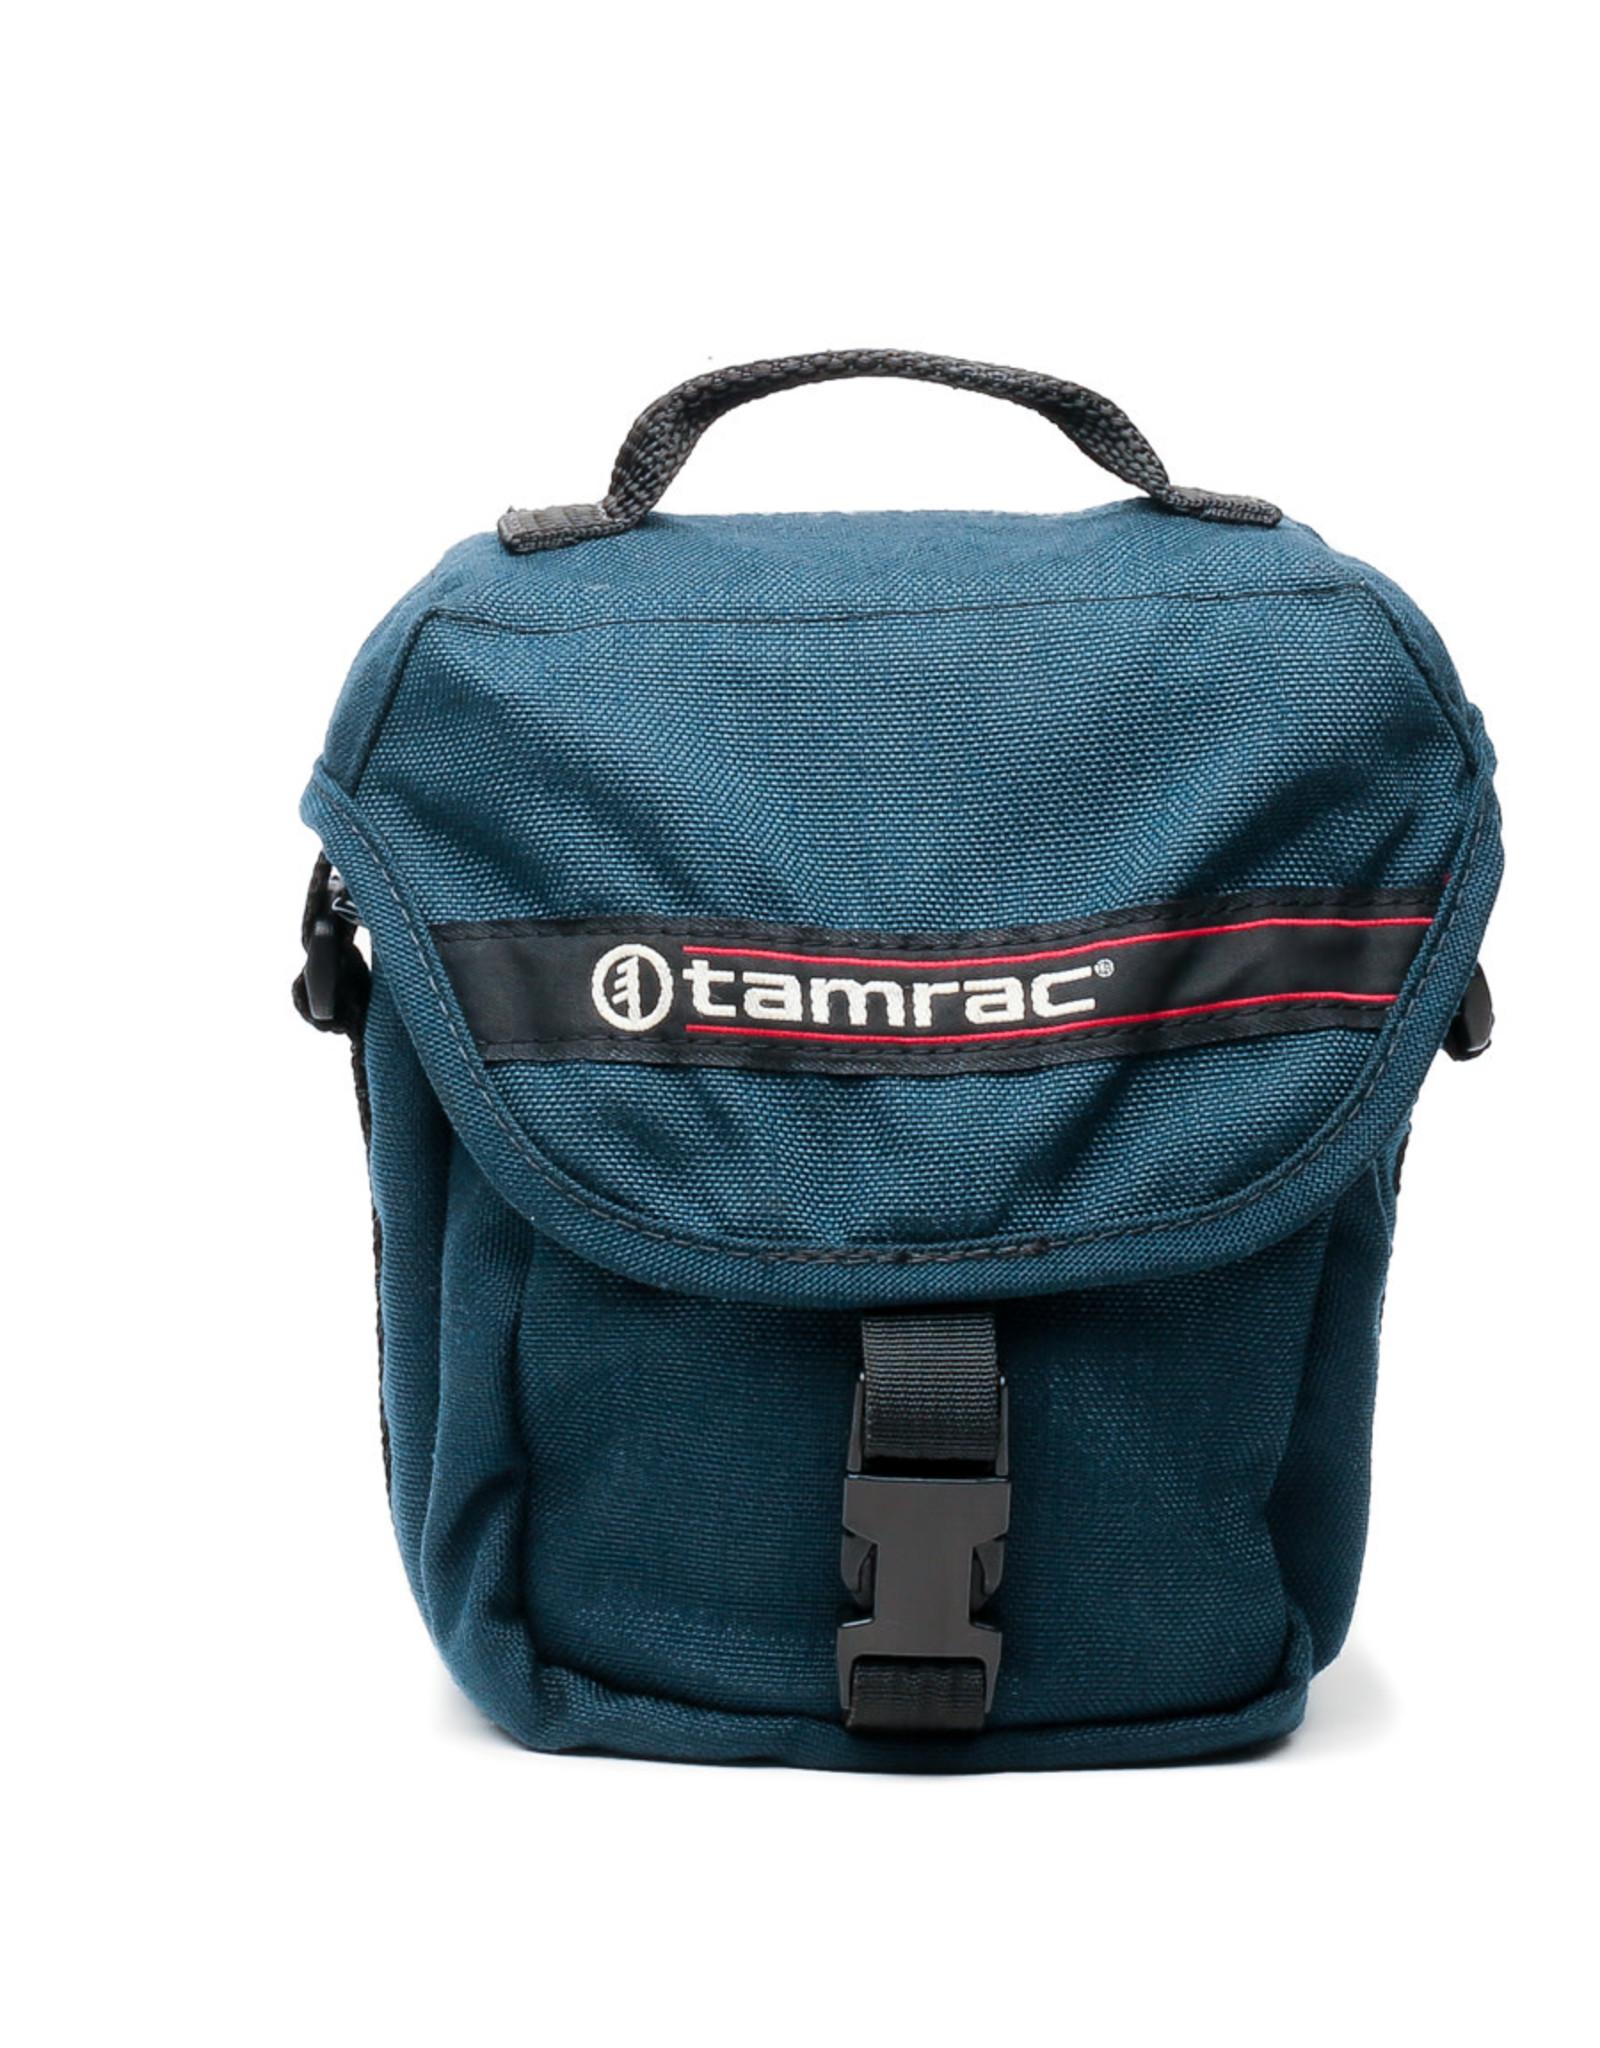 Tamrac Tamrac 600R Mid-Size Camera Bag (Blue)